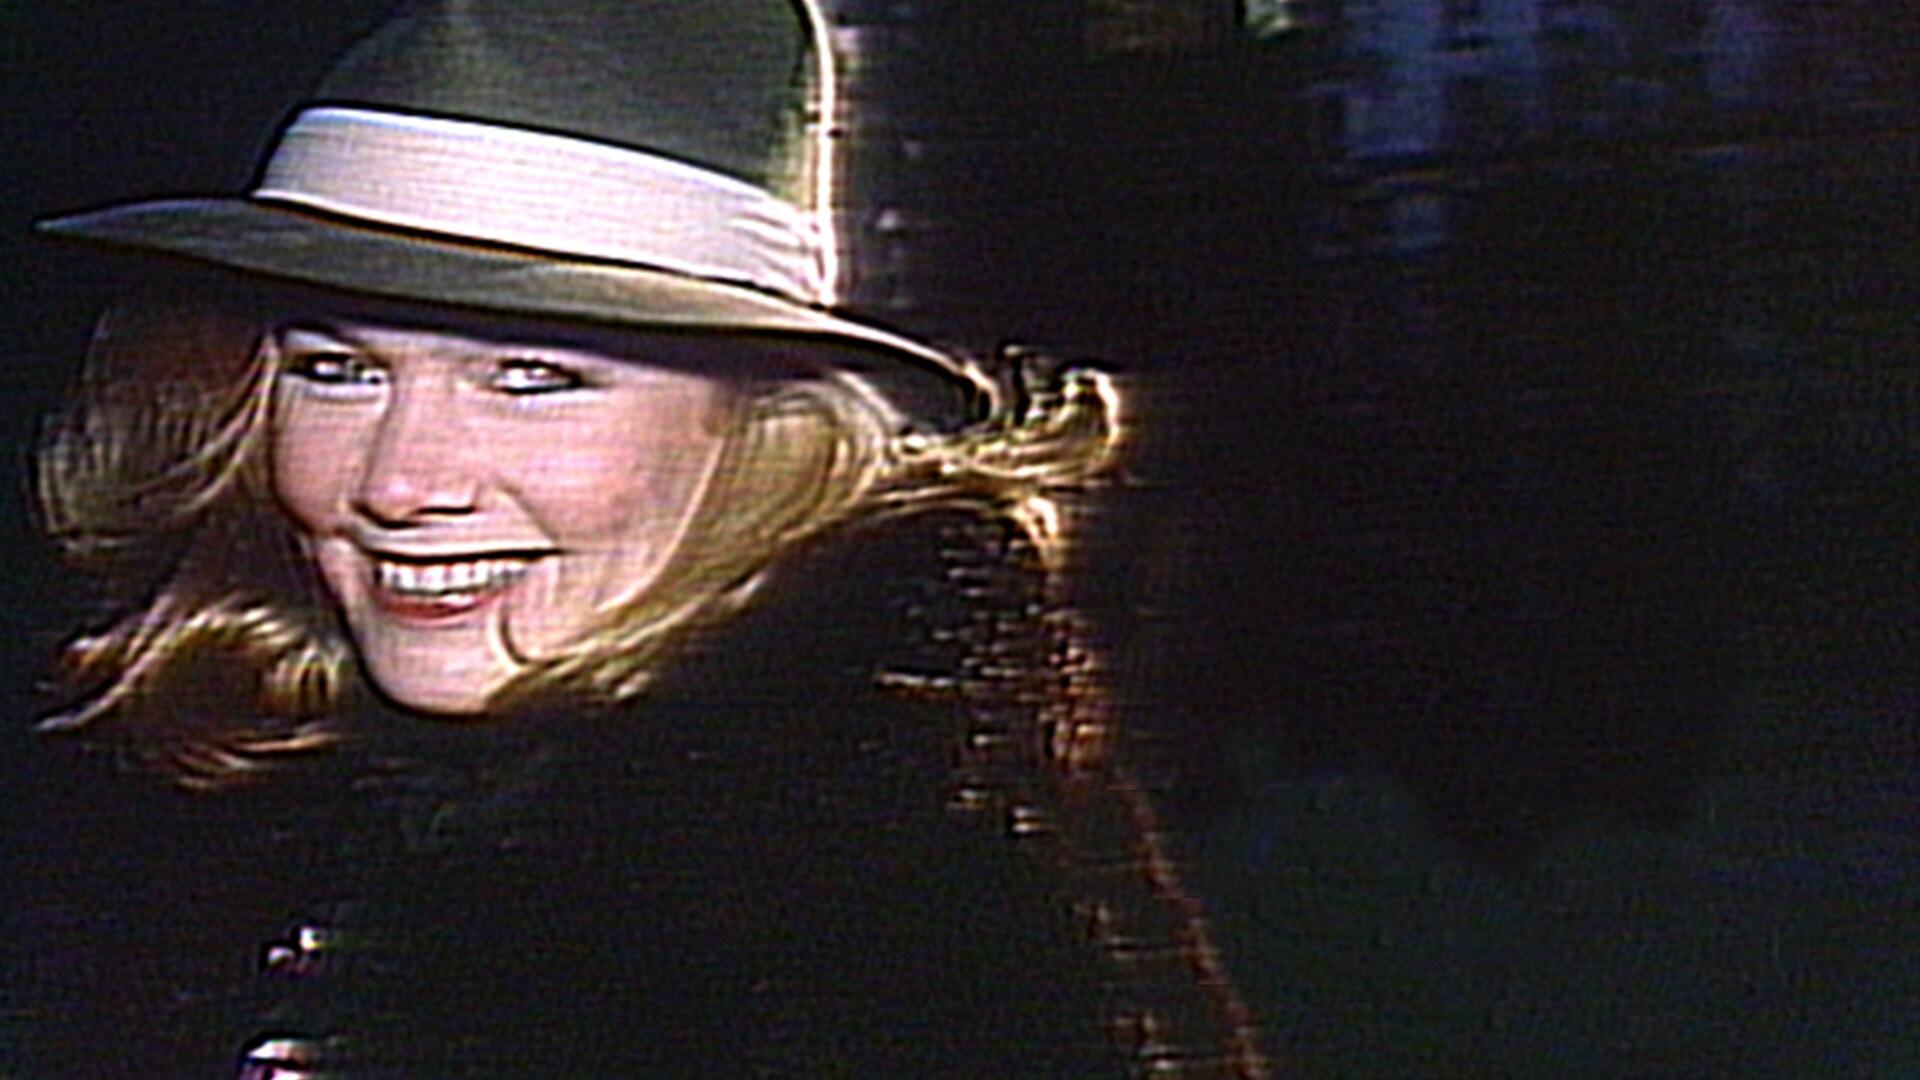 Kathleen Turner: January 12, 1985